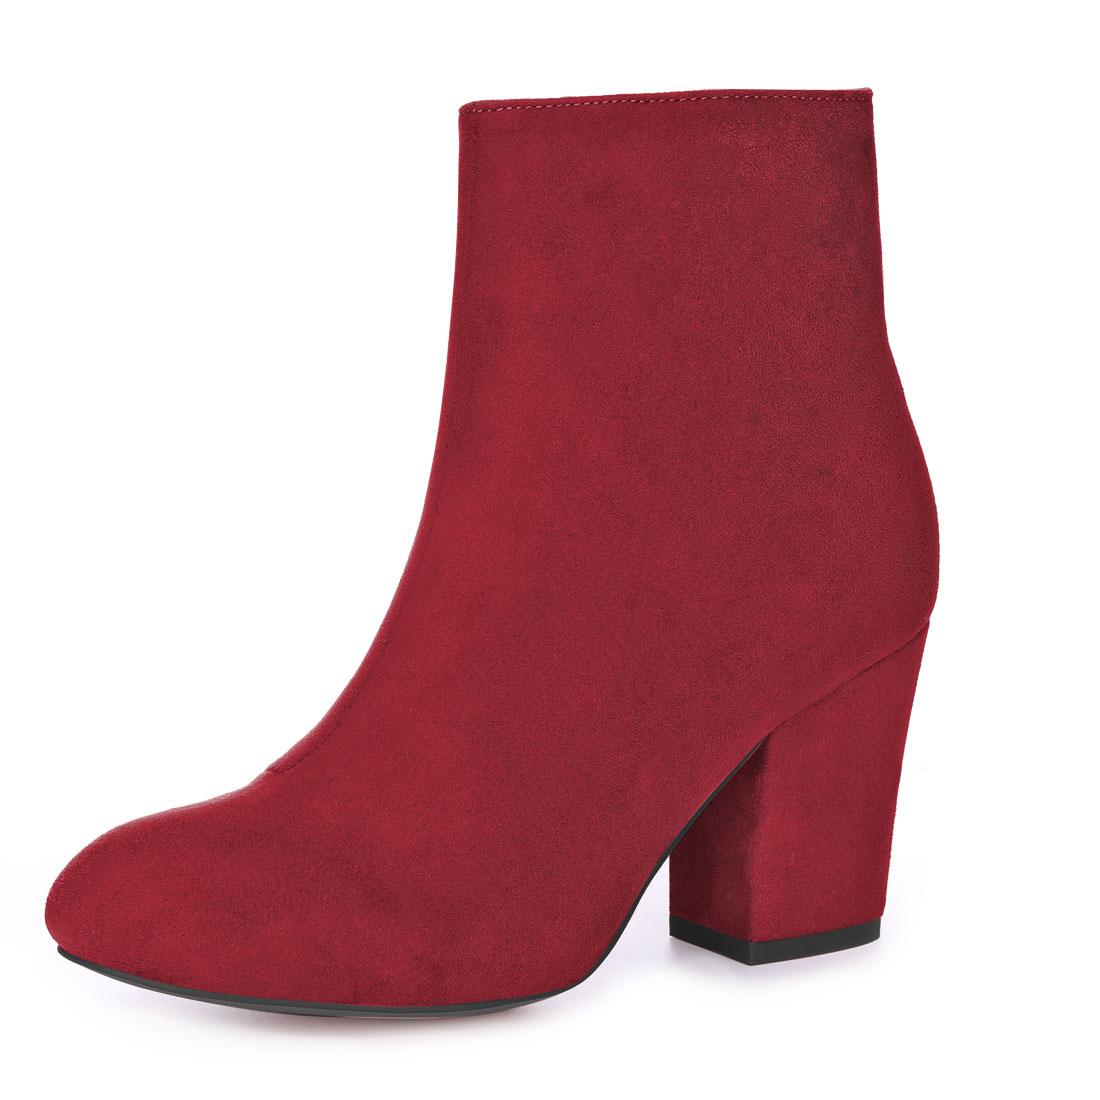 Allegra K Women Round Toe Side Zipper Block Heel Ankle Boots Red US 5.5